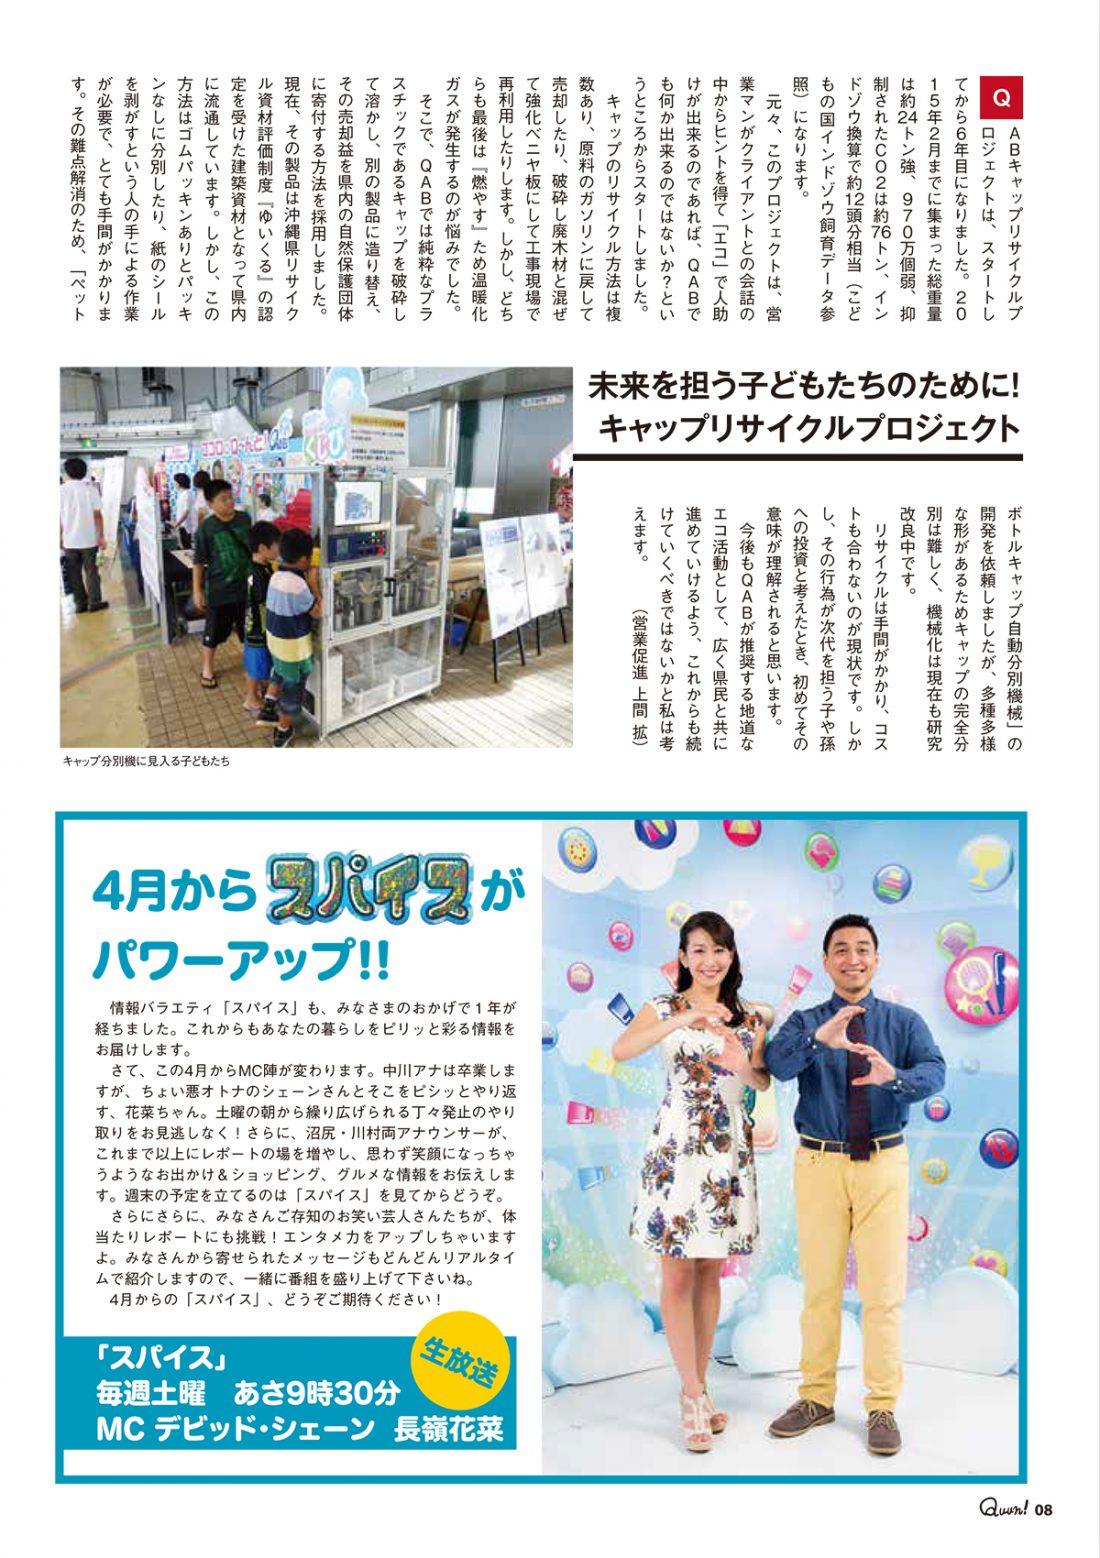 https://www.qab.co.jp/qgoro/wp-content/uploads/quun_0310-1100x1558.jpg